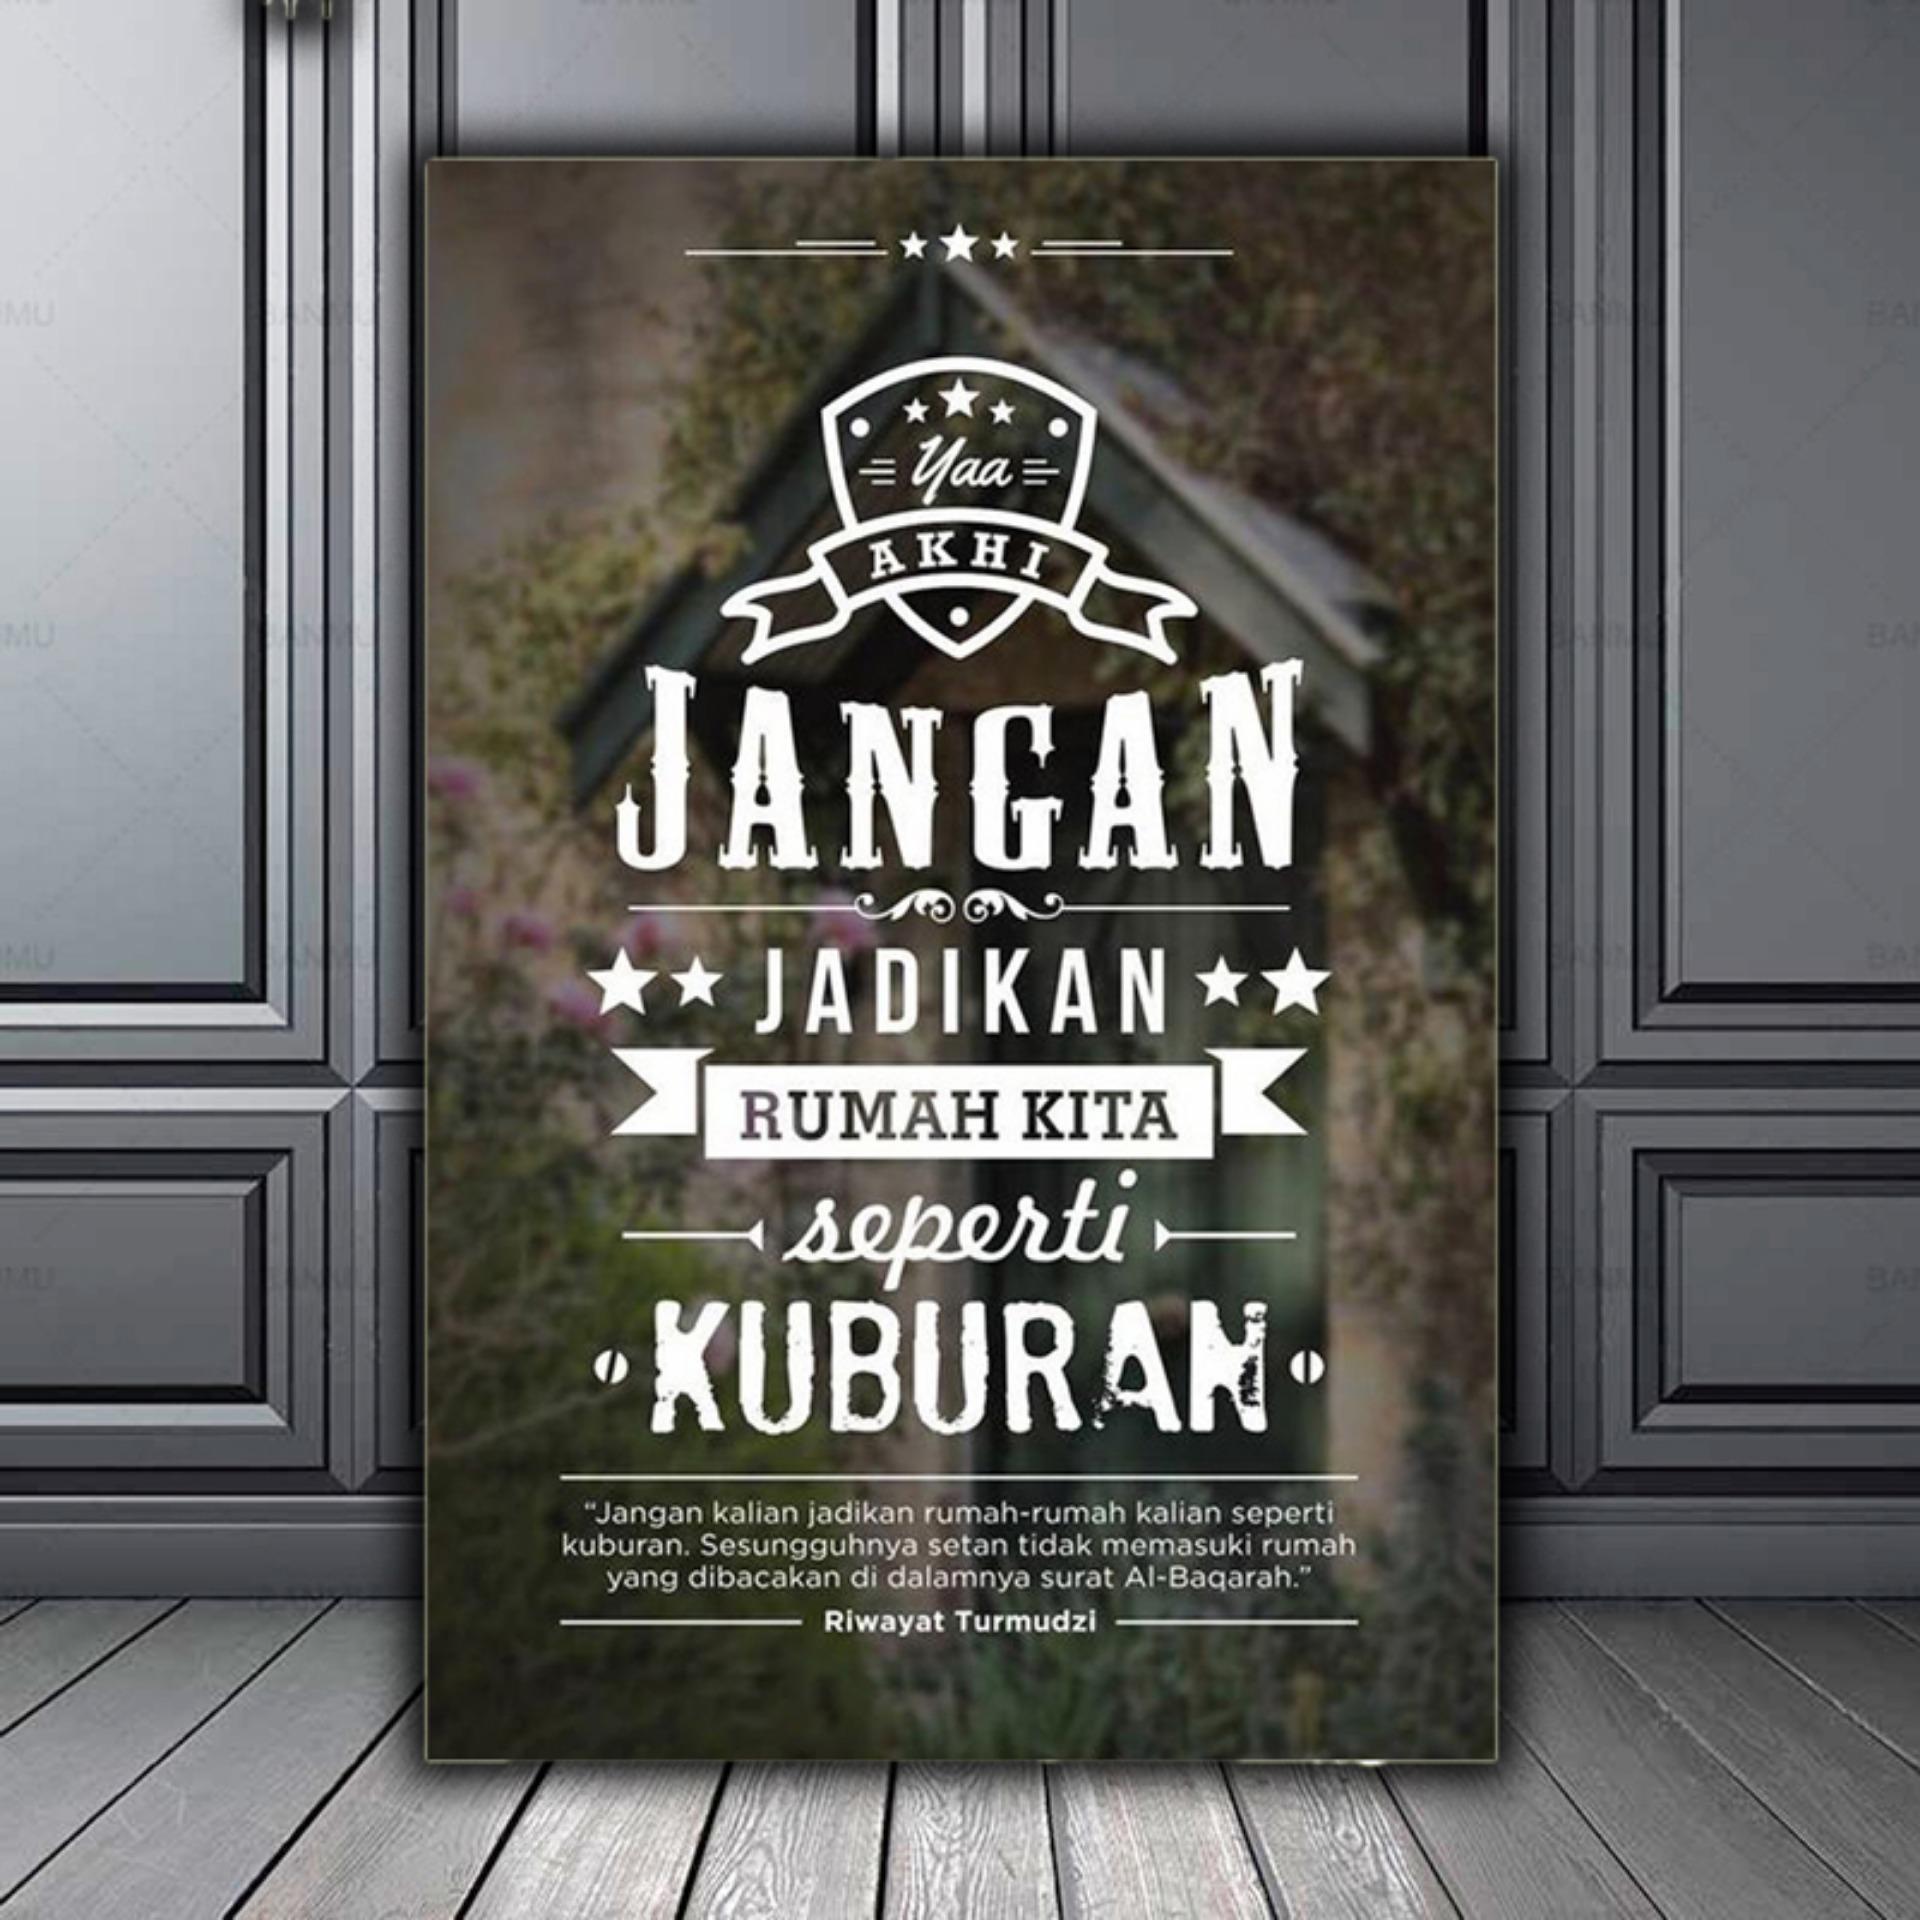 HIASAN DINDING / POSTER KAYU / WALL DECOR / DEKORASI RUMAH / HIASAN KAMAR / HIASAN DAPUR / HIASAN PINTU / HIASAN MINIMALIS / HIASAN UNIK / BINGKAI / HIASAN ...